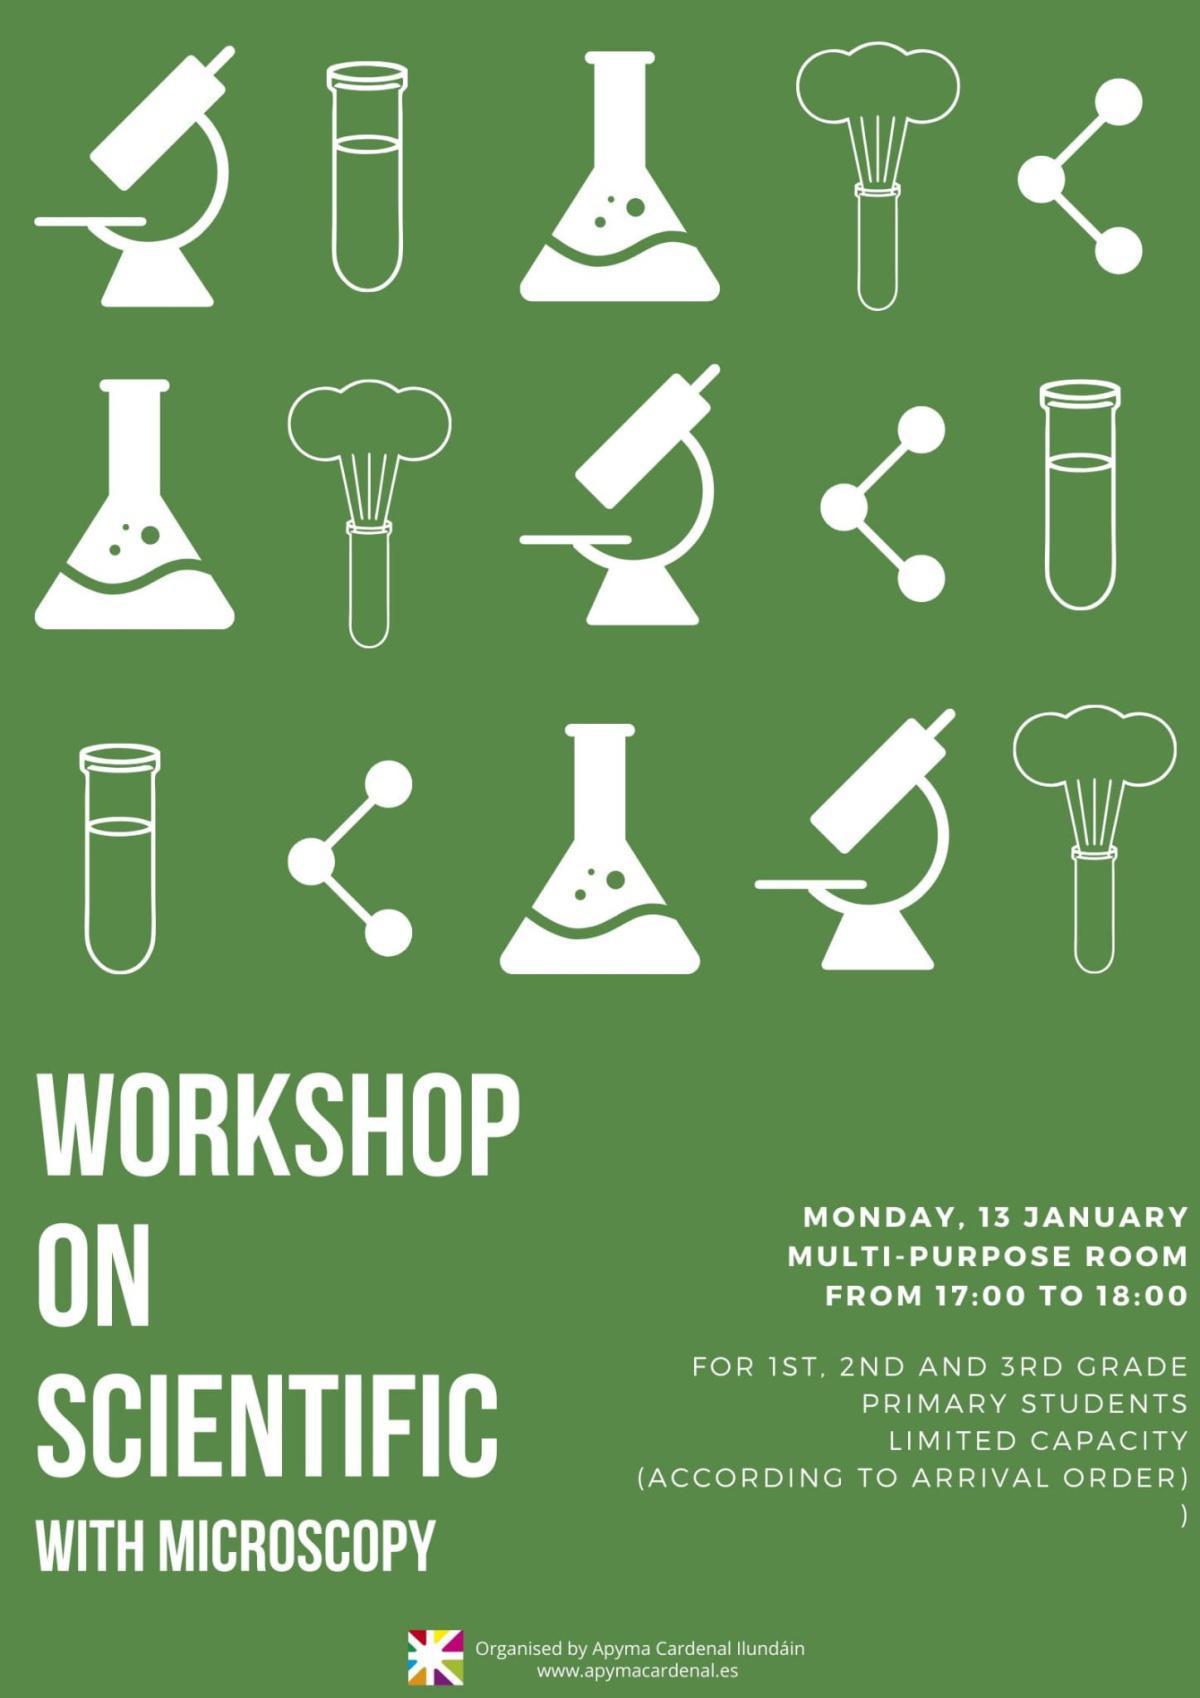 Workshop on scientific experiments